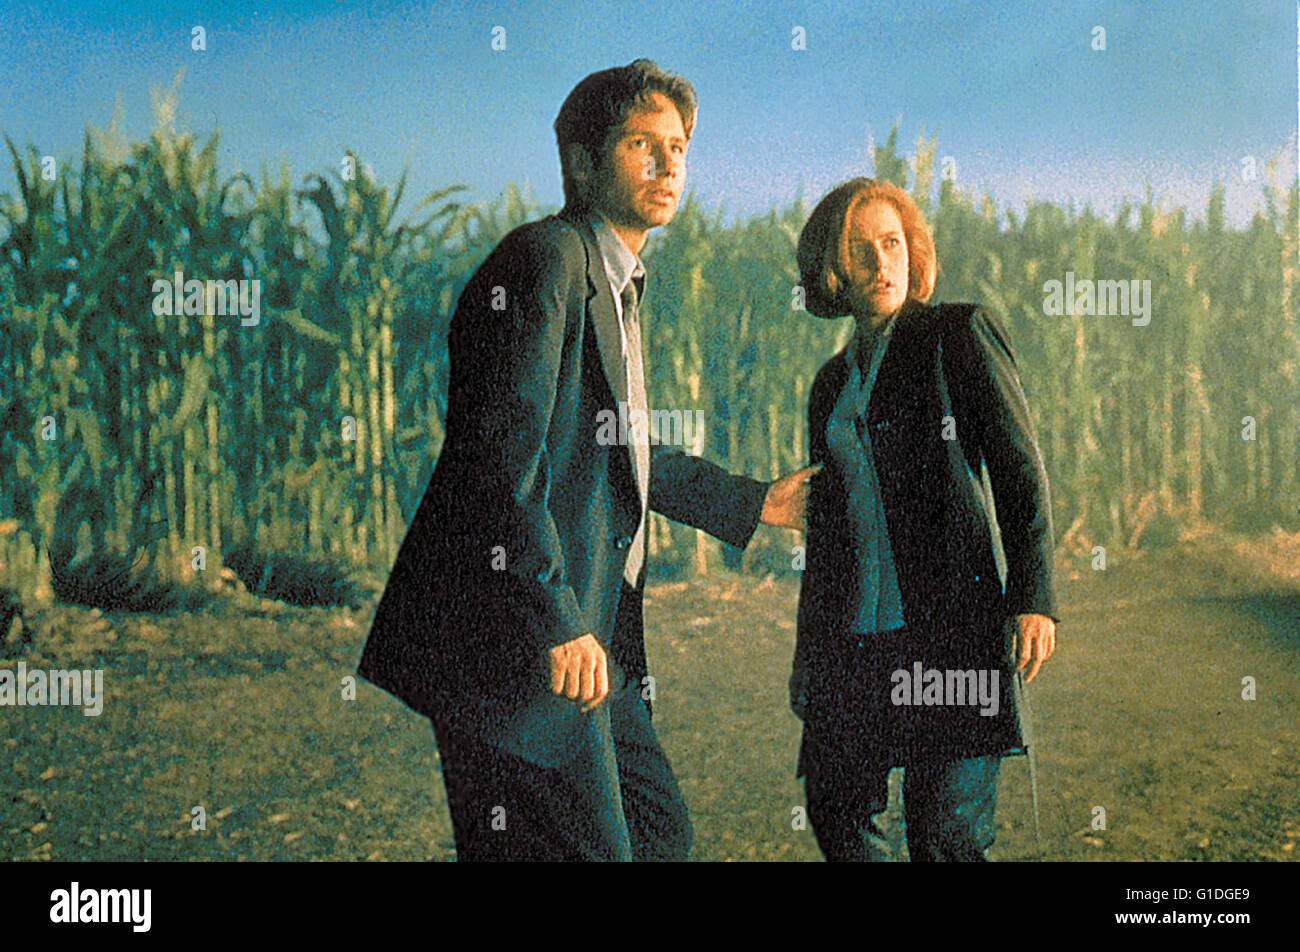 Akte X - Der Film / David Duchovny / Gillian Anderson, - Stock Image